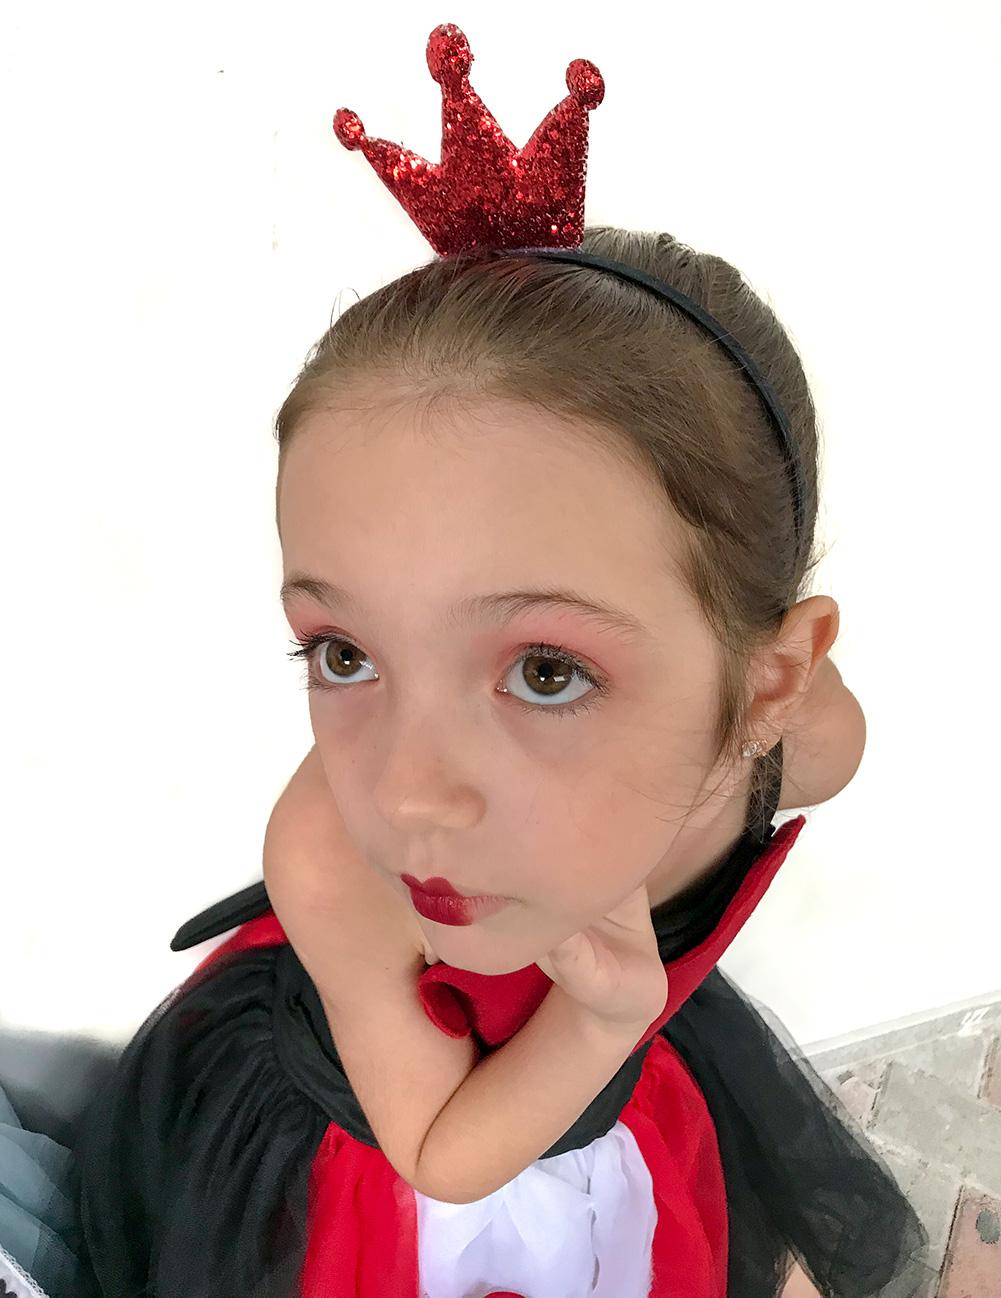 Fantasias do carnaval 2018 – Alice no País das Maravilhas